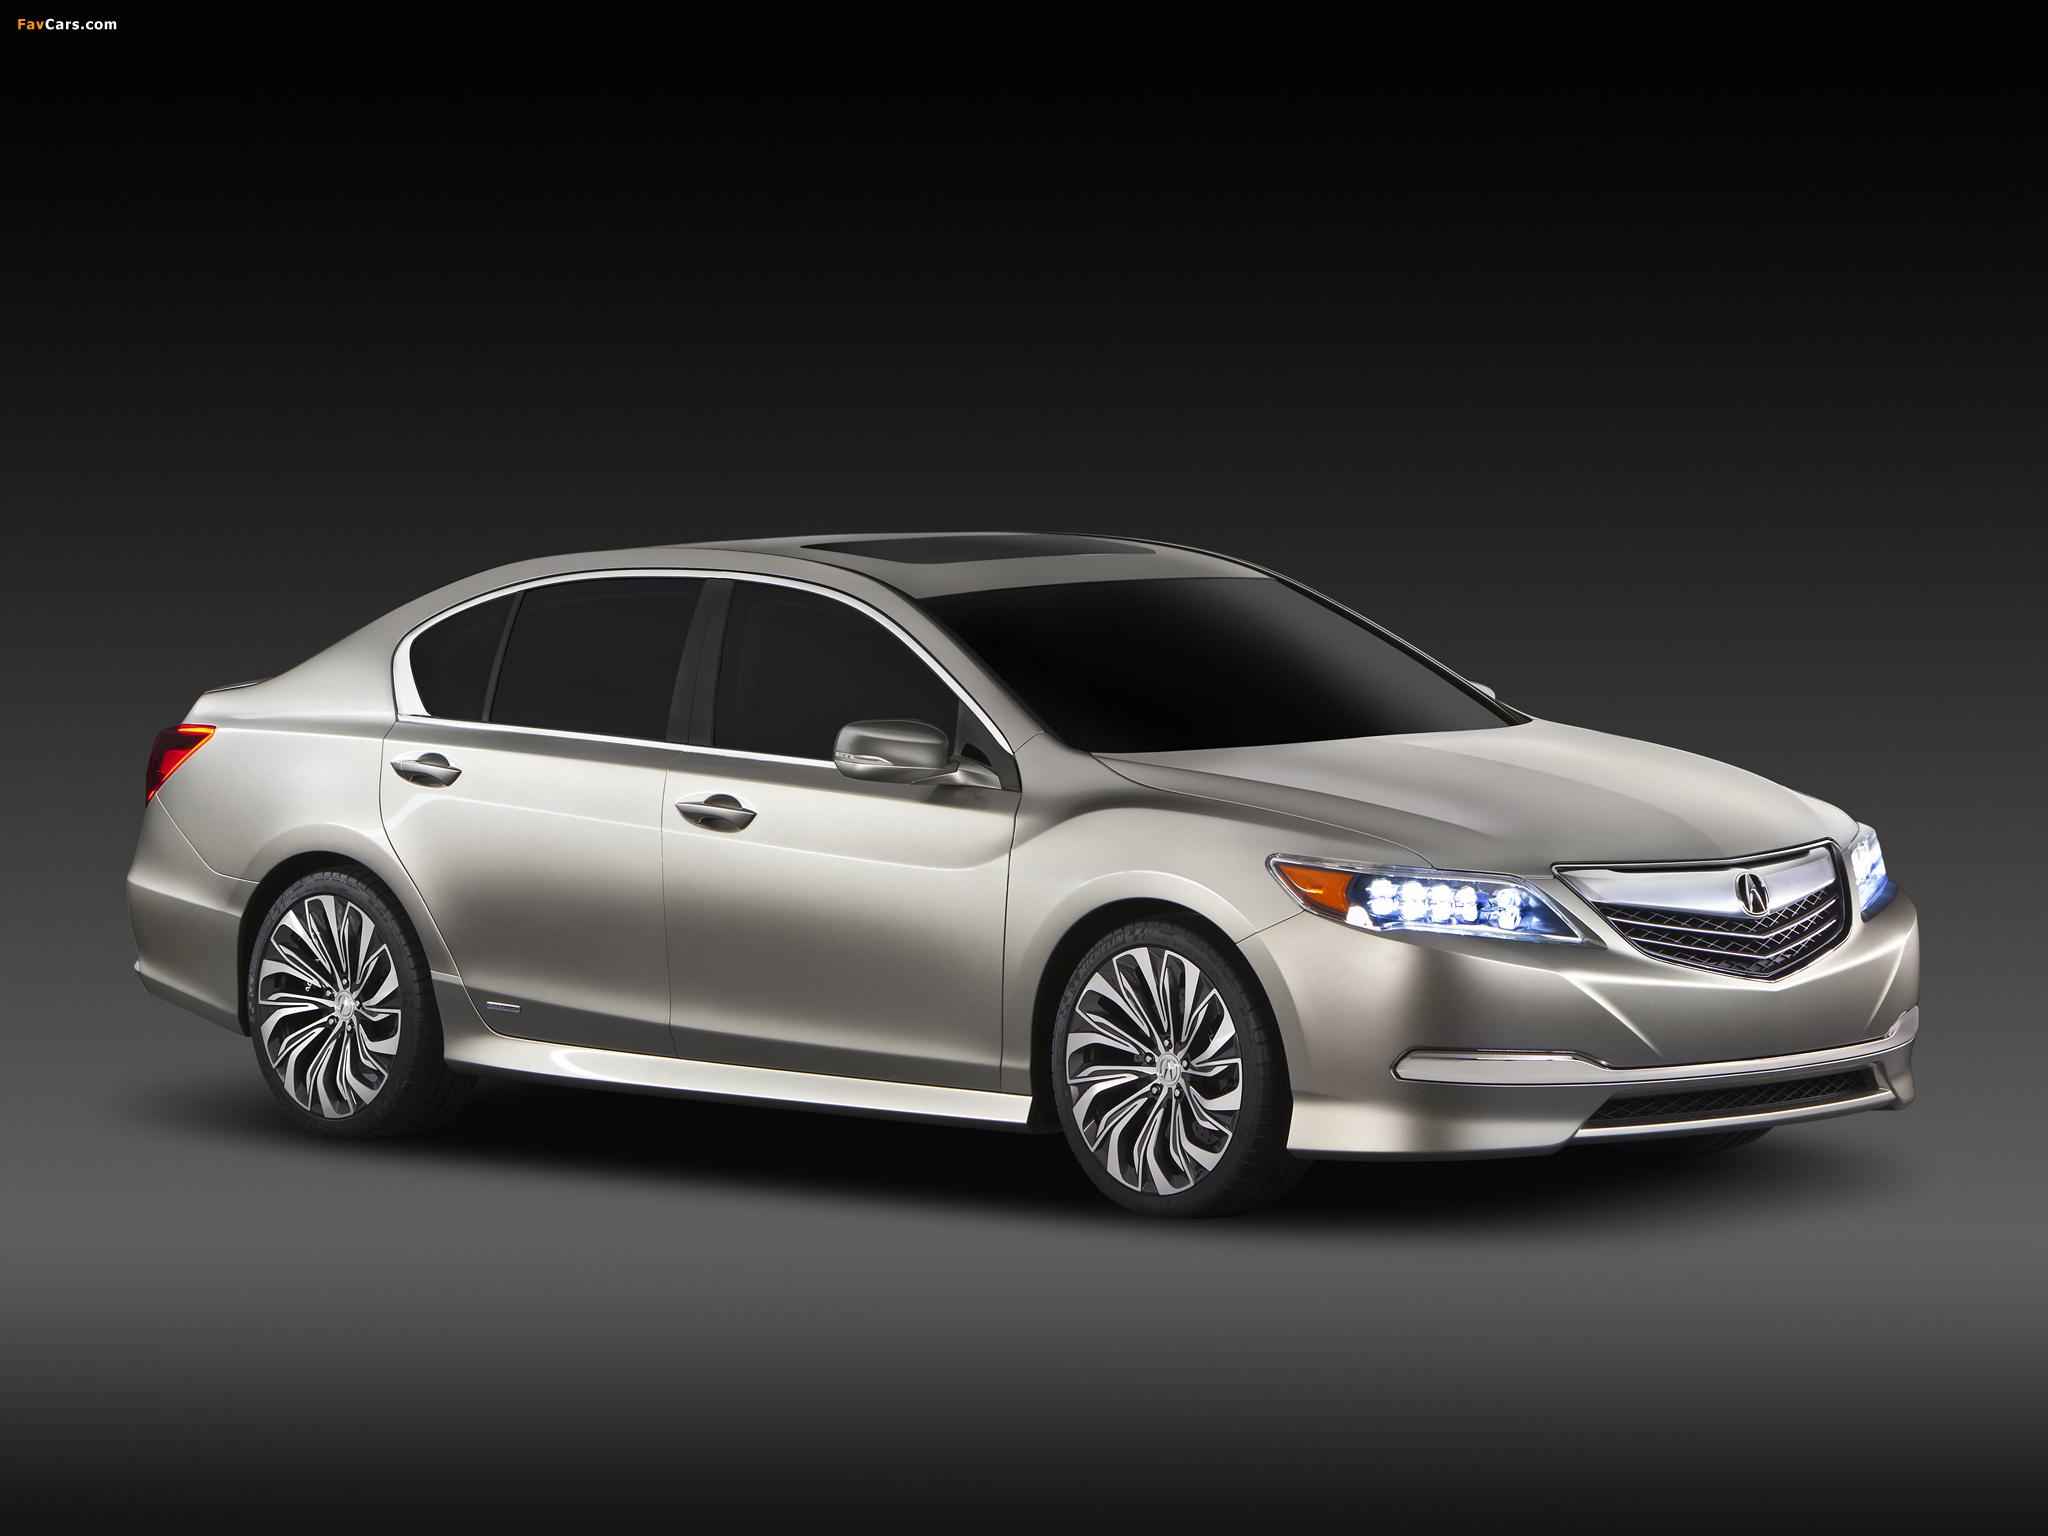 Acura RLX Concept (2012) images (2048 x 1536)